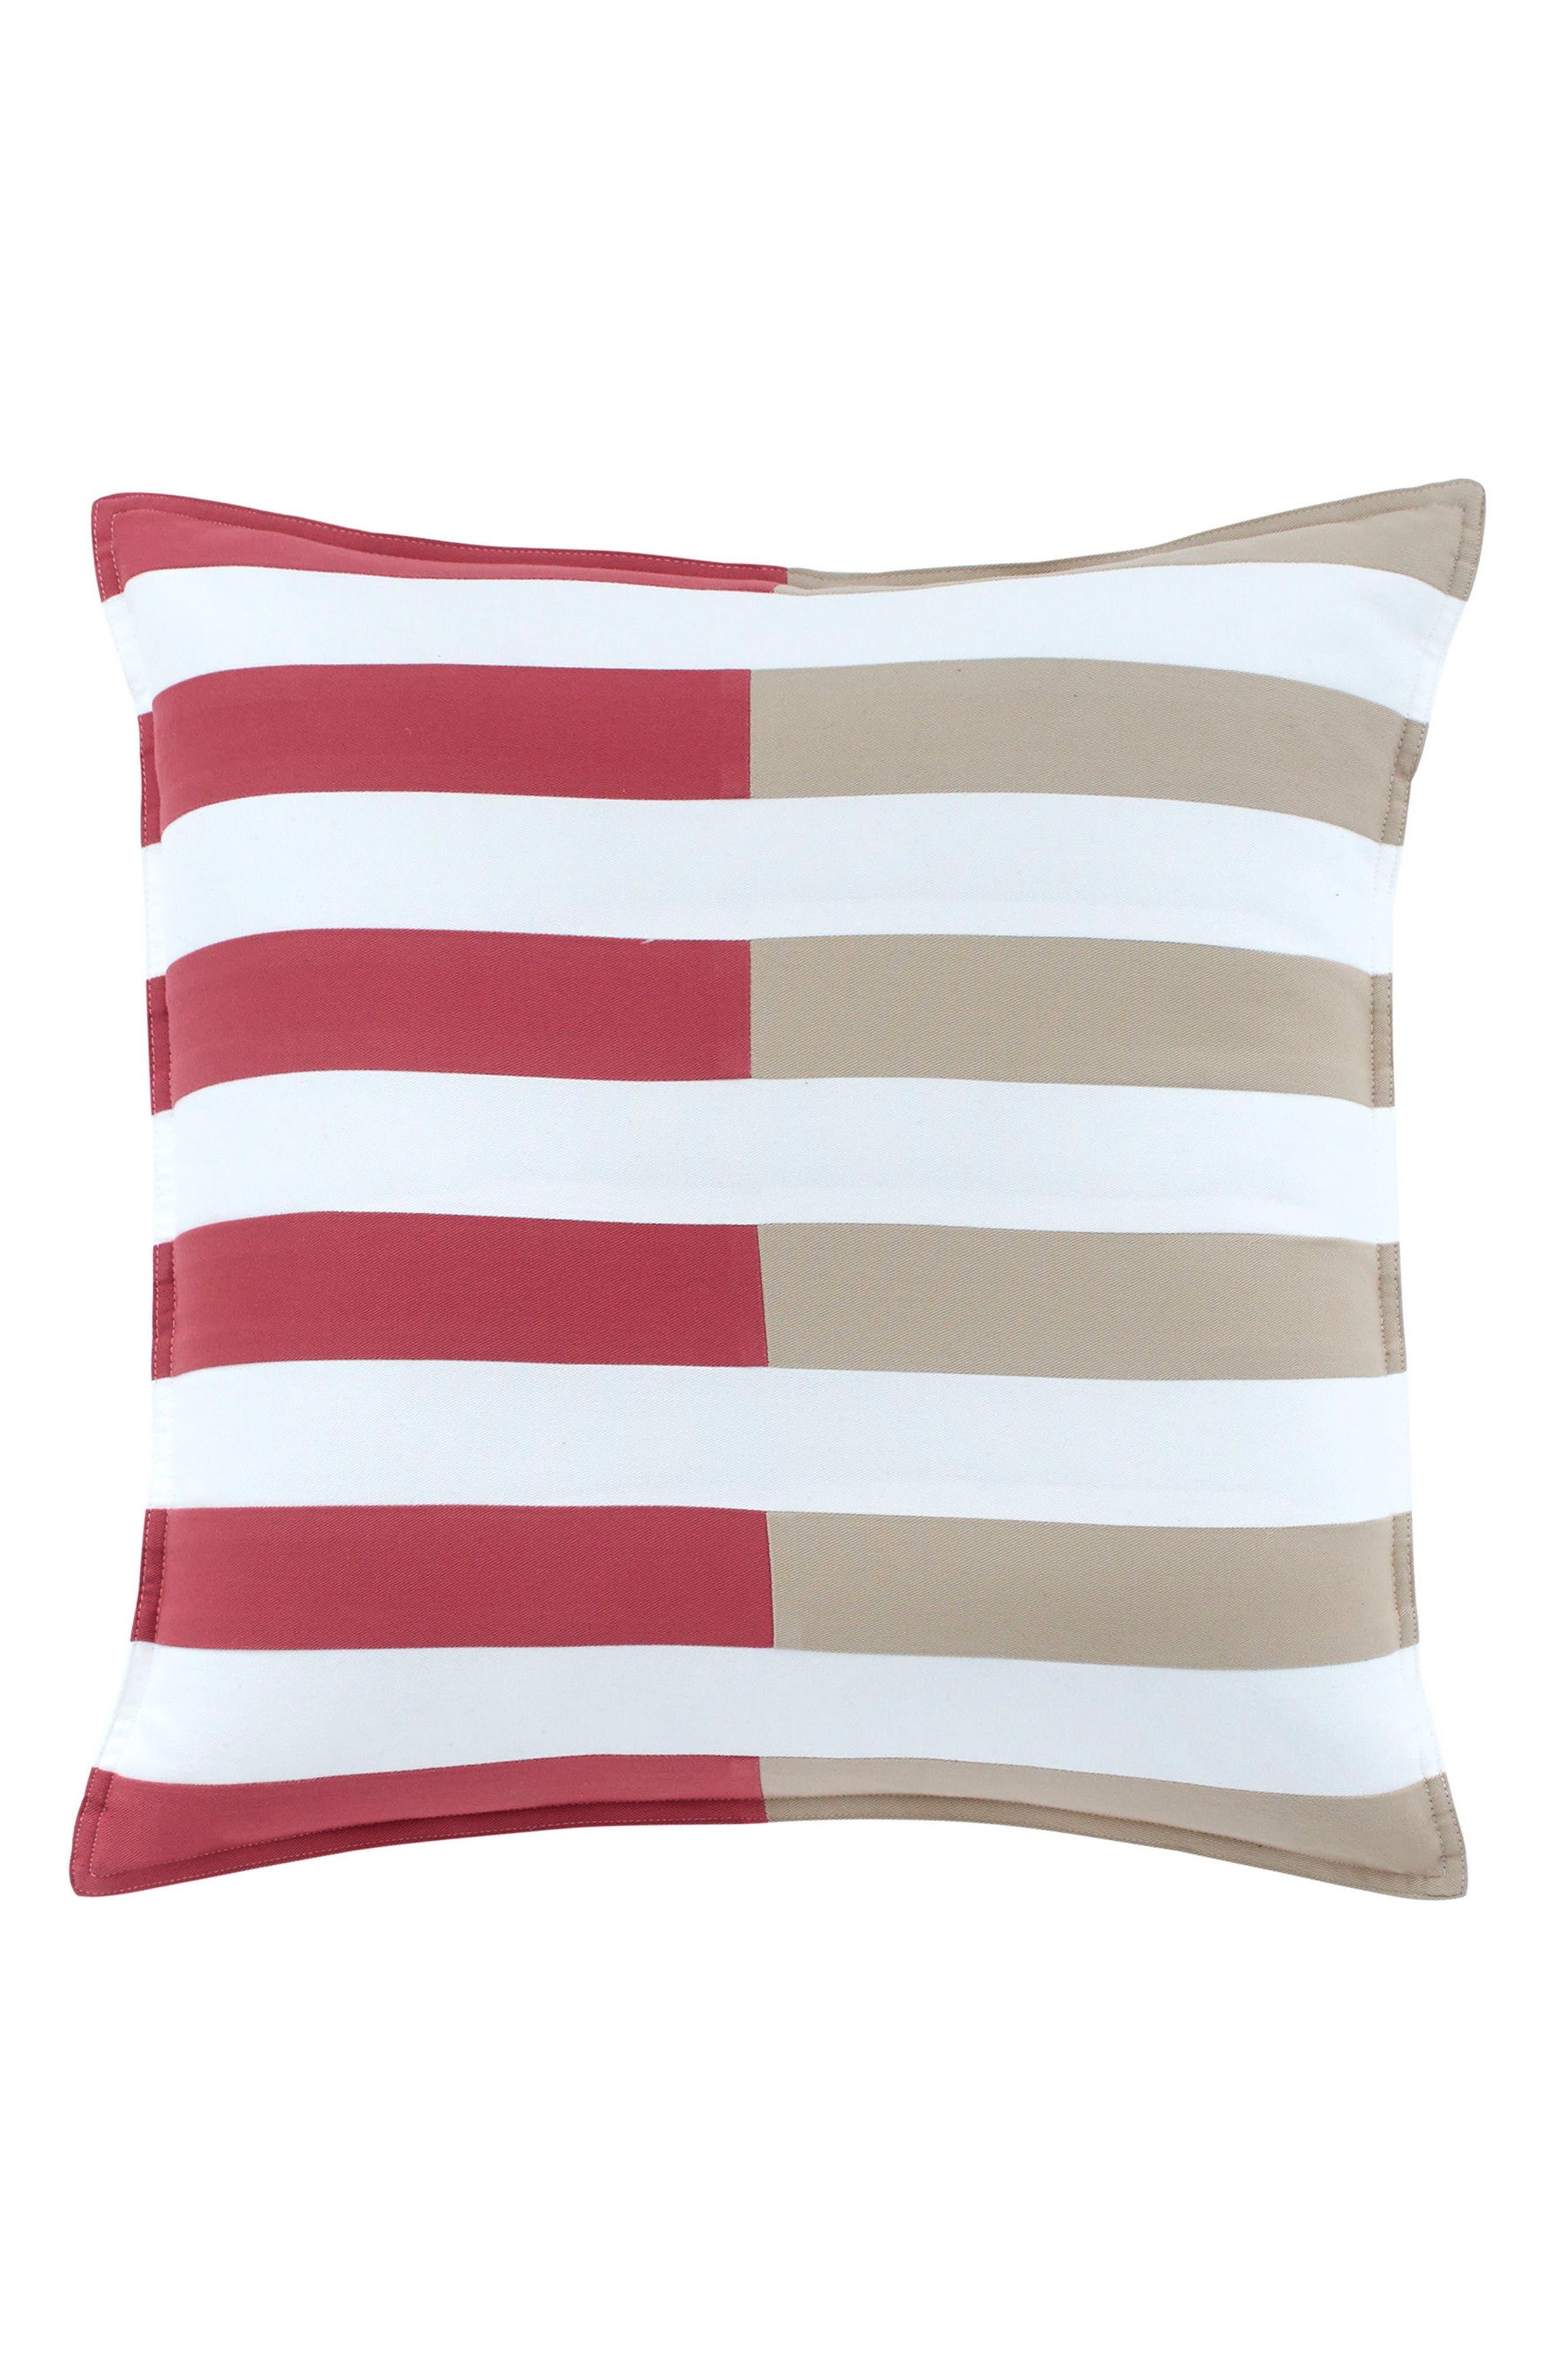 Skipjack Chino Pieced Accent Pillow,                         Main,                         color, Charleston Red/ Humus/ White